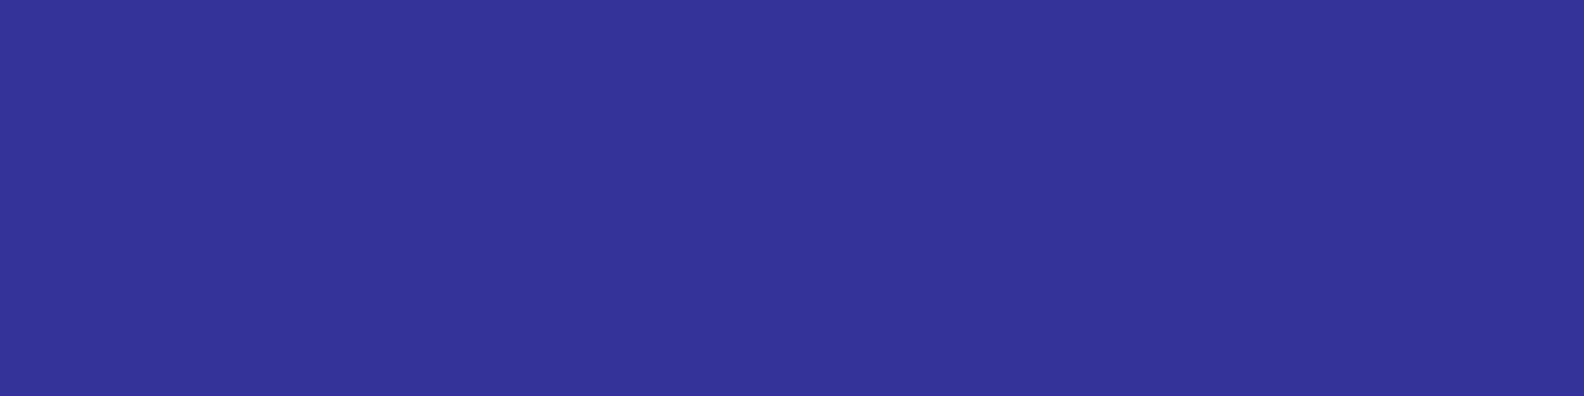 1584x396 Blue Pigment Solid Color Background